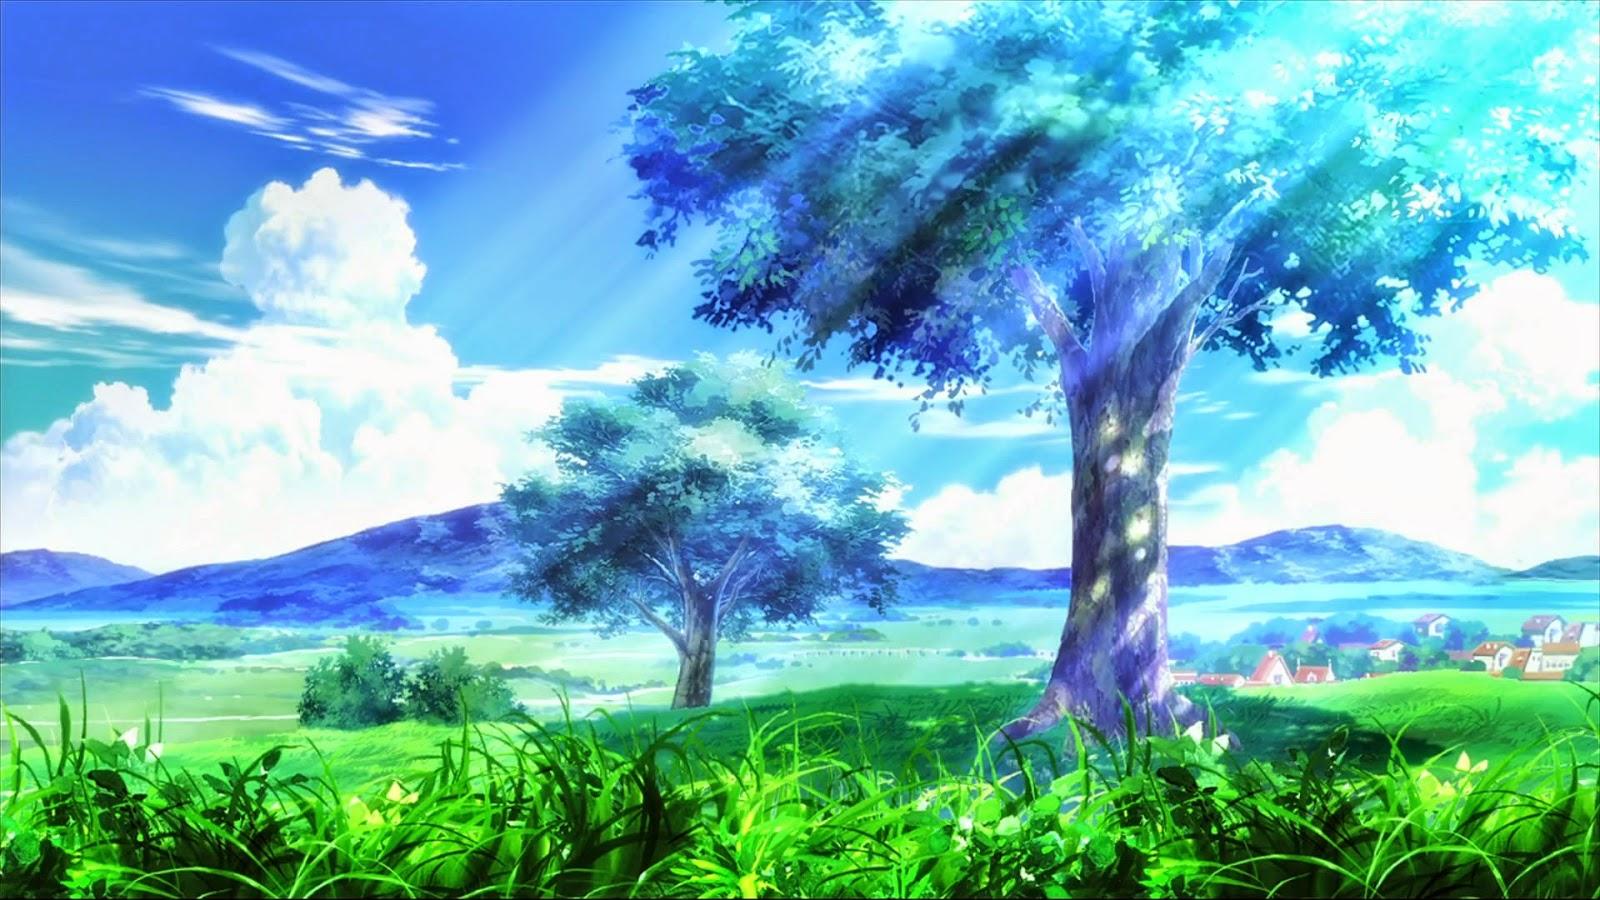 Cloud 9 Wallpaper New Fresh Pubg Wallpaper Hd Wallpaper: Anime: การ์ตูน อาร์ตๆ สวยๆ